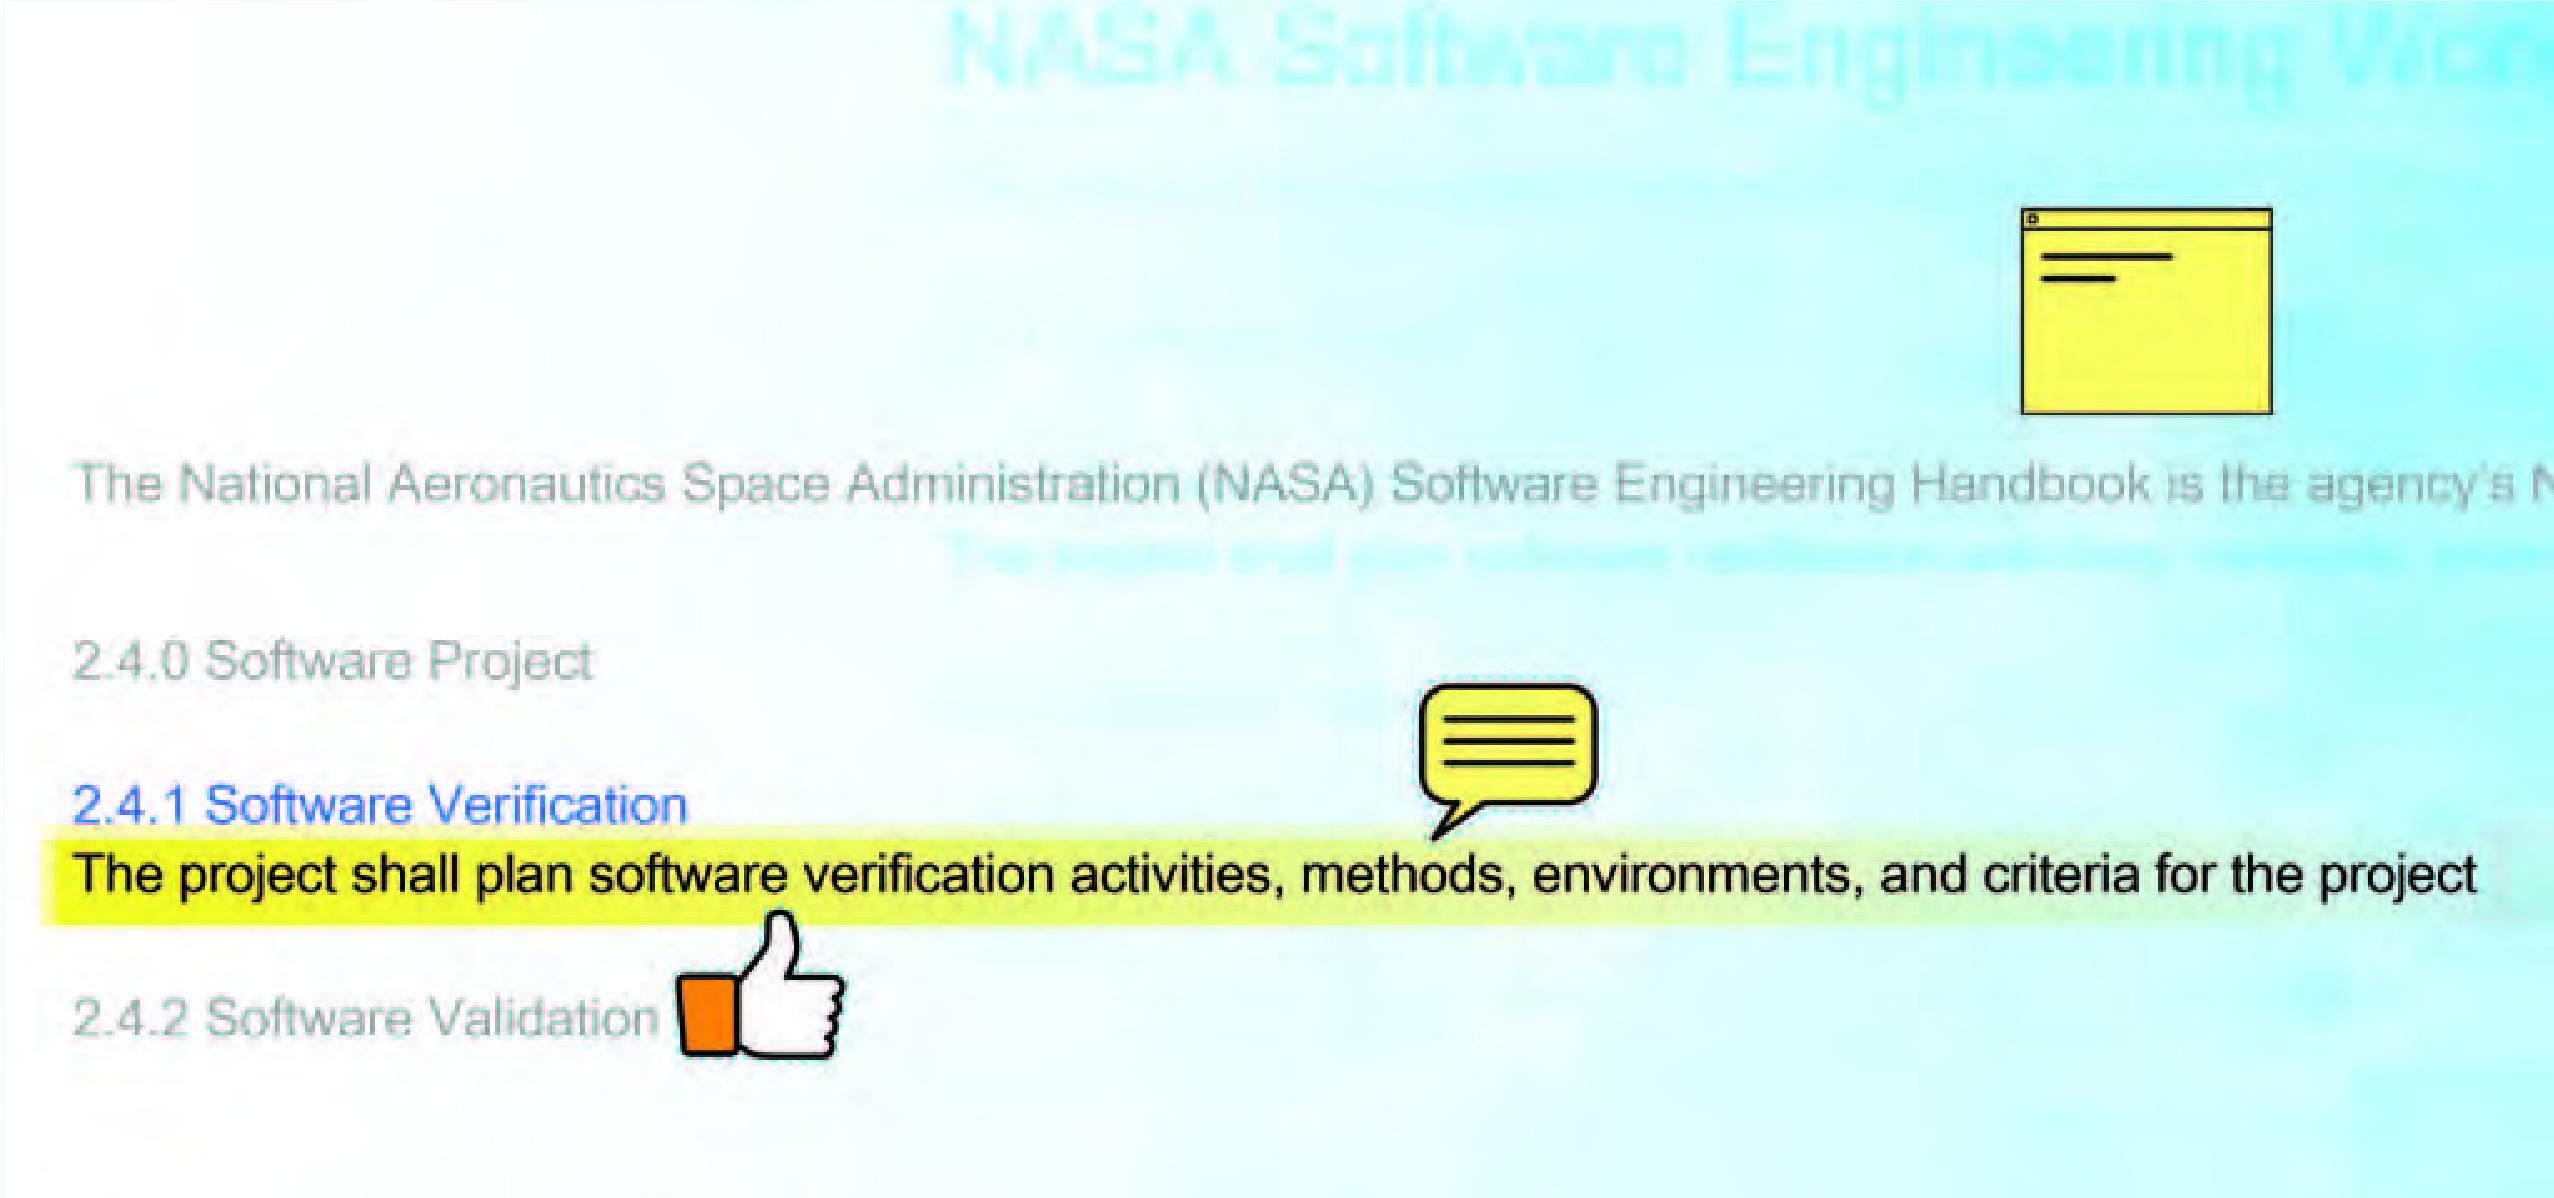 Software Engineering Handbook Illustration